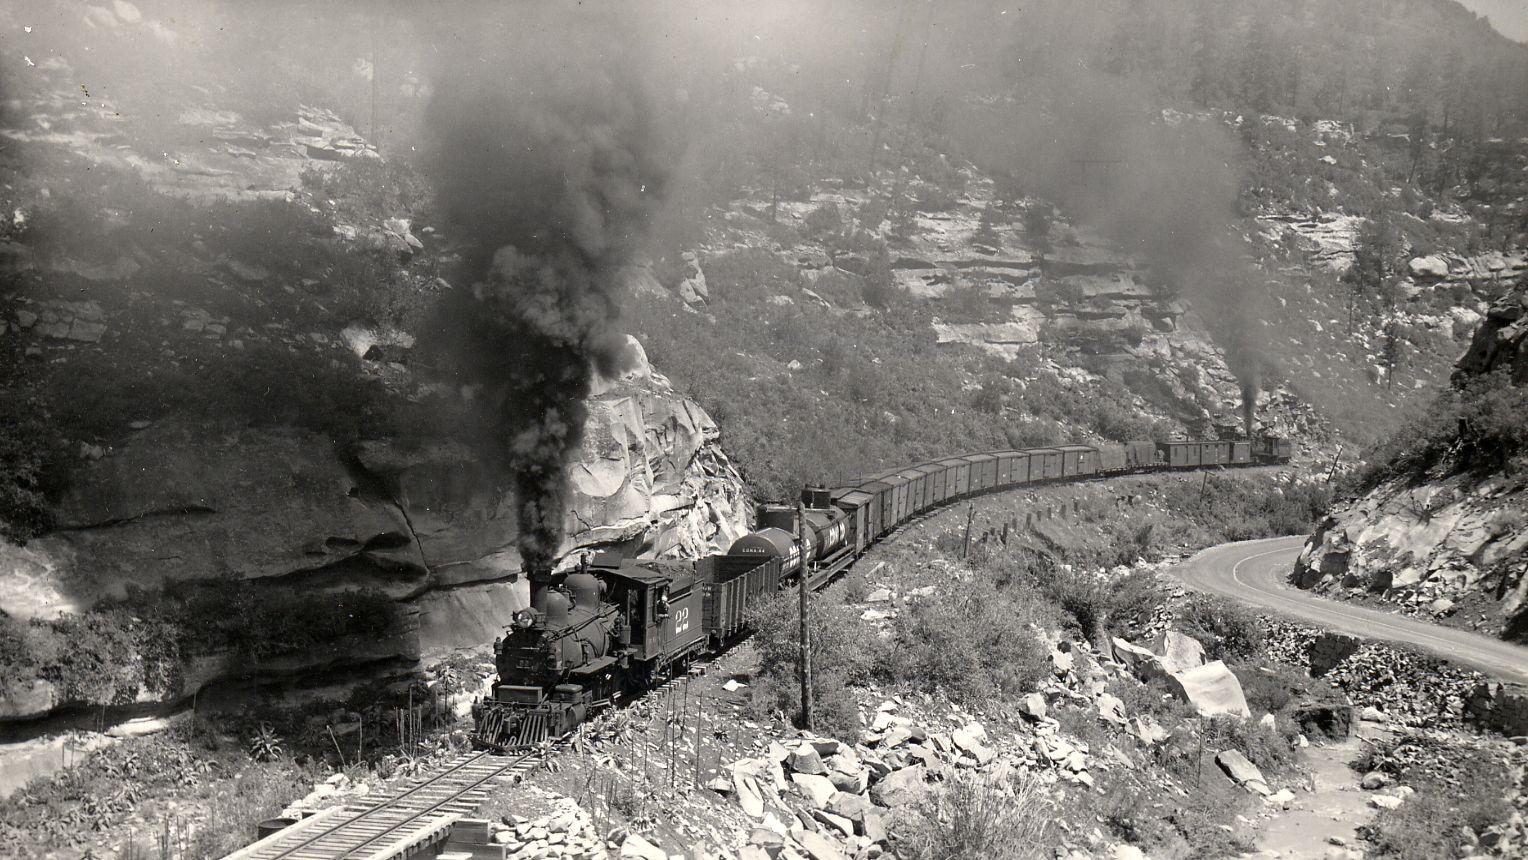 Photo: #22 West of Durango, CO